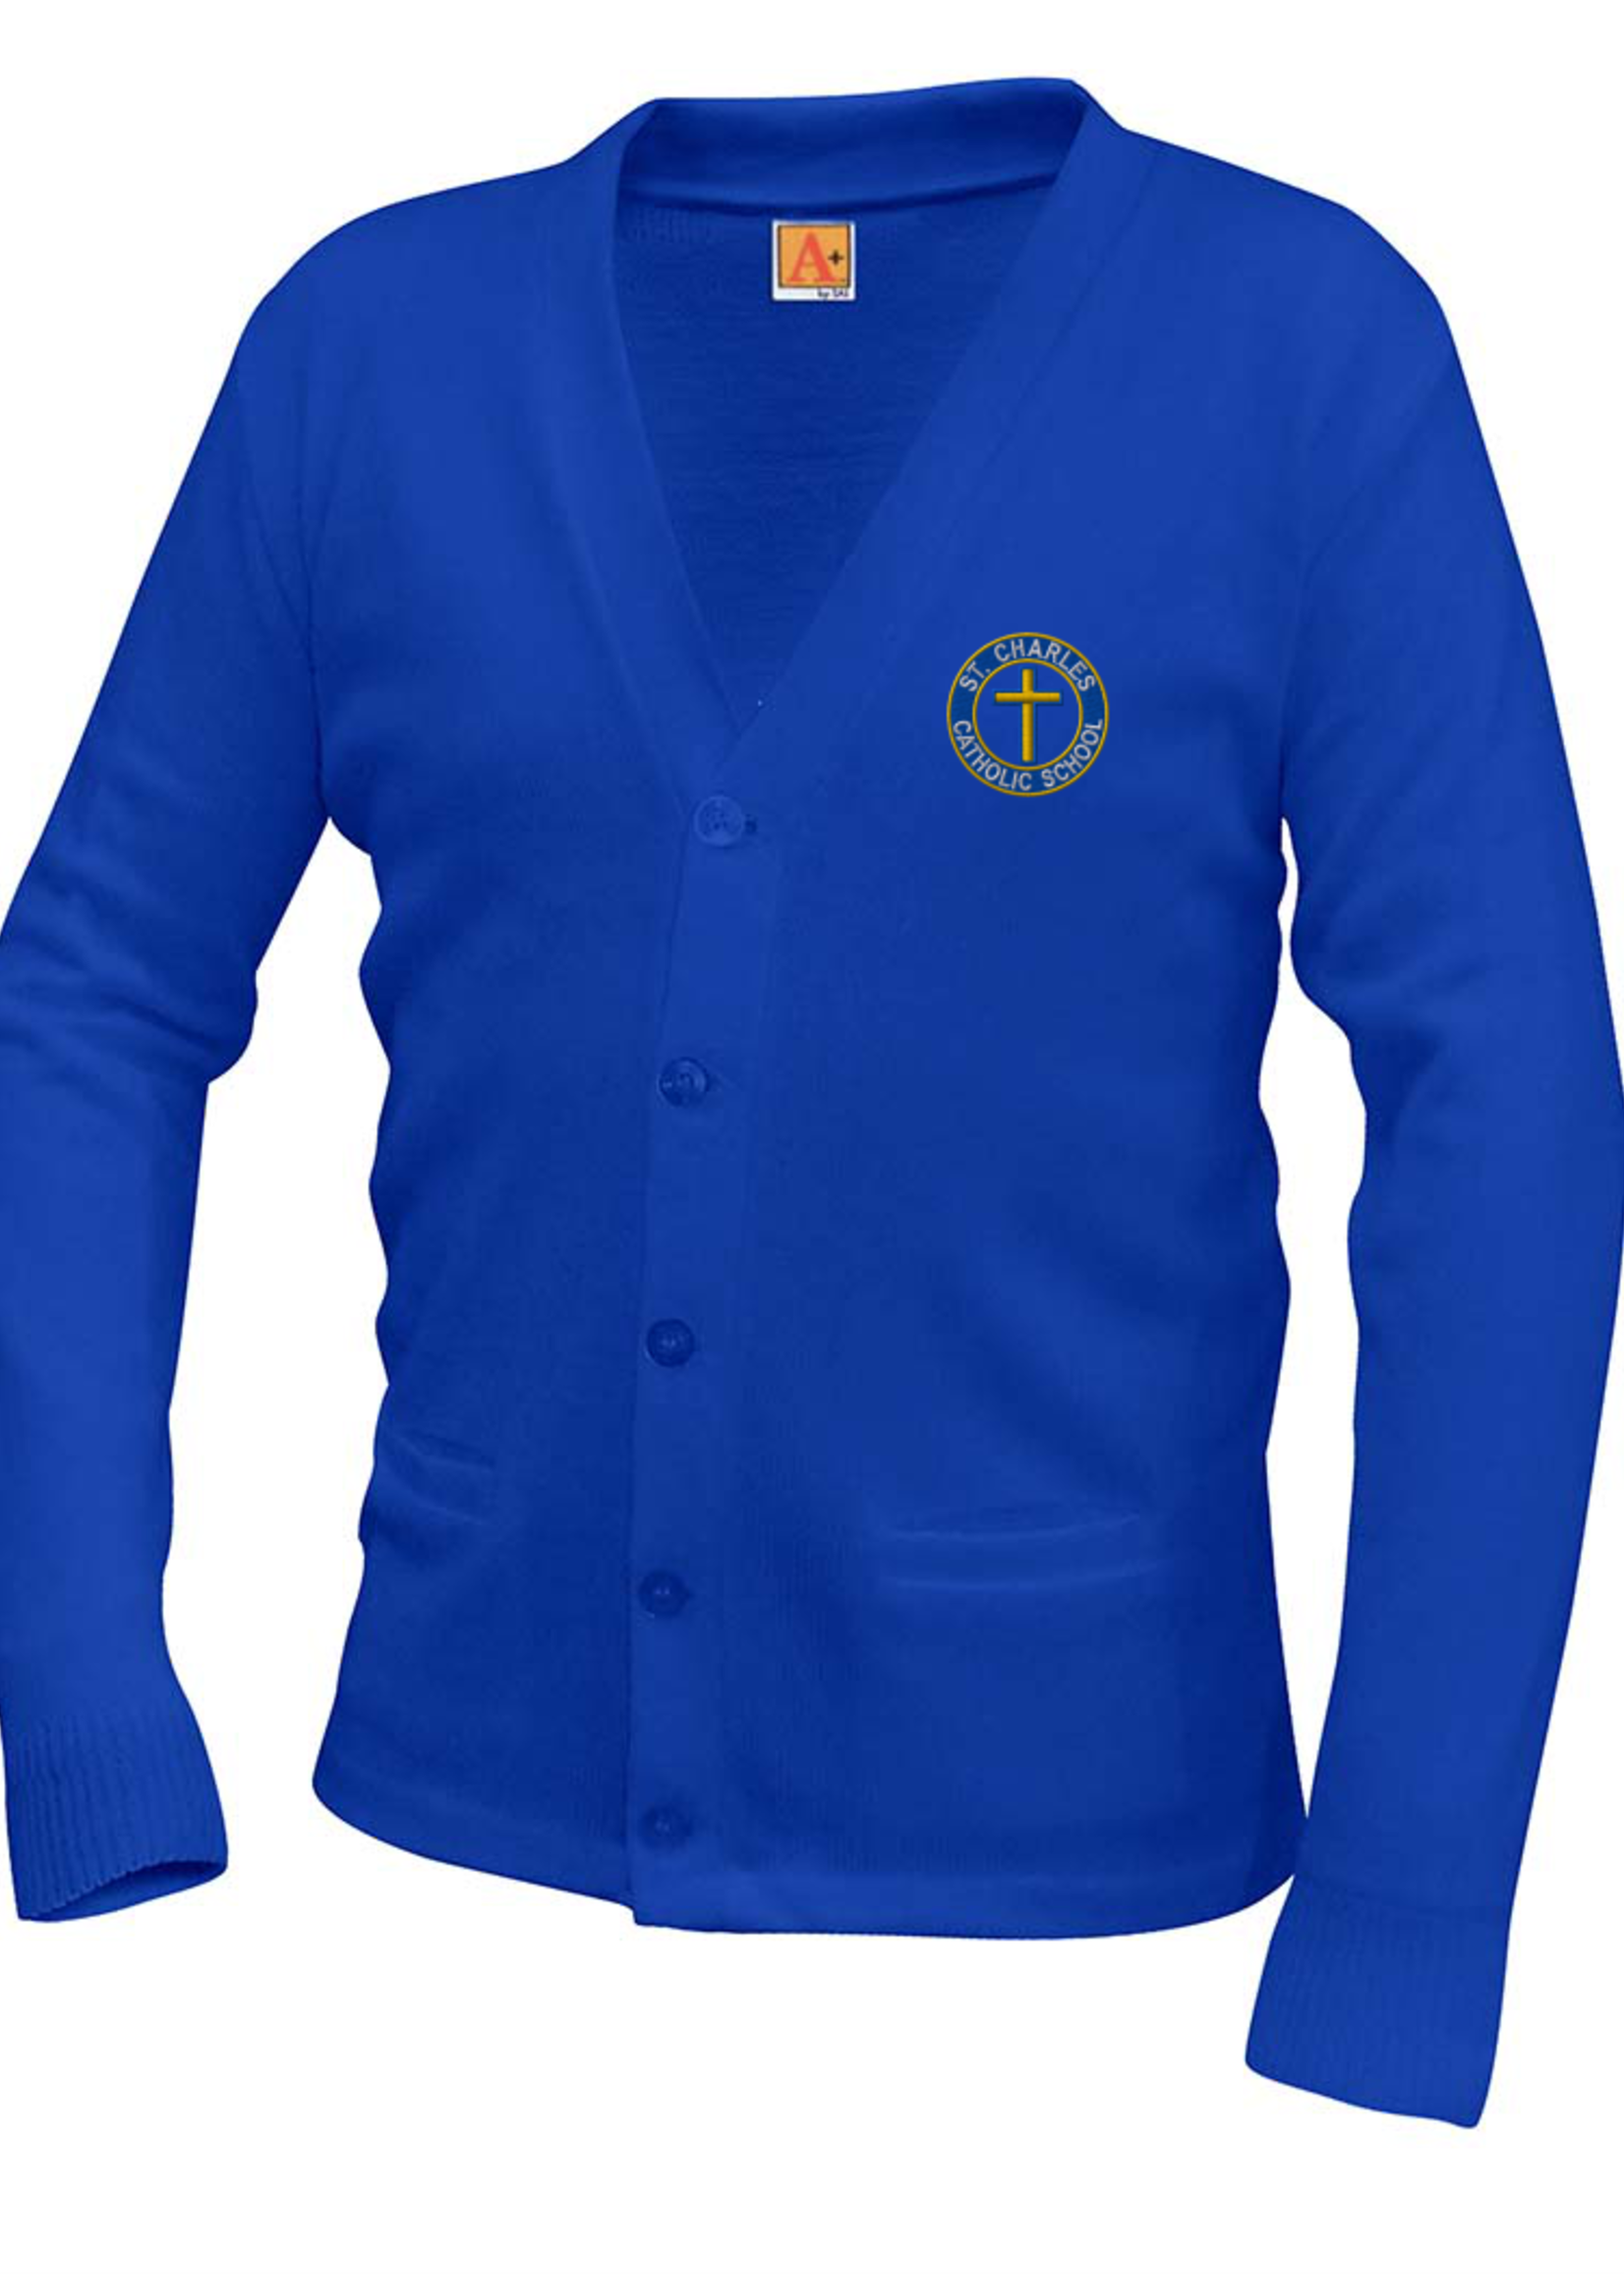 TUS SCCS Royal V-neck cardigan sweater with pockets K-4